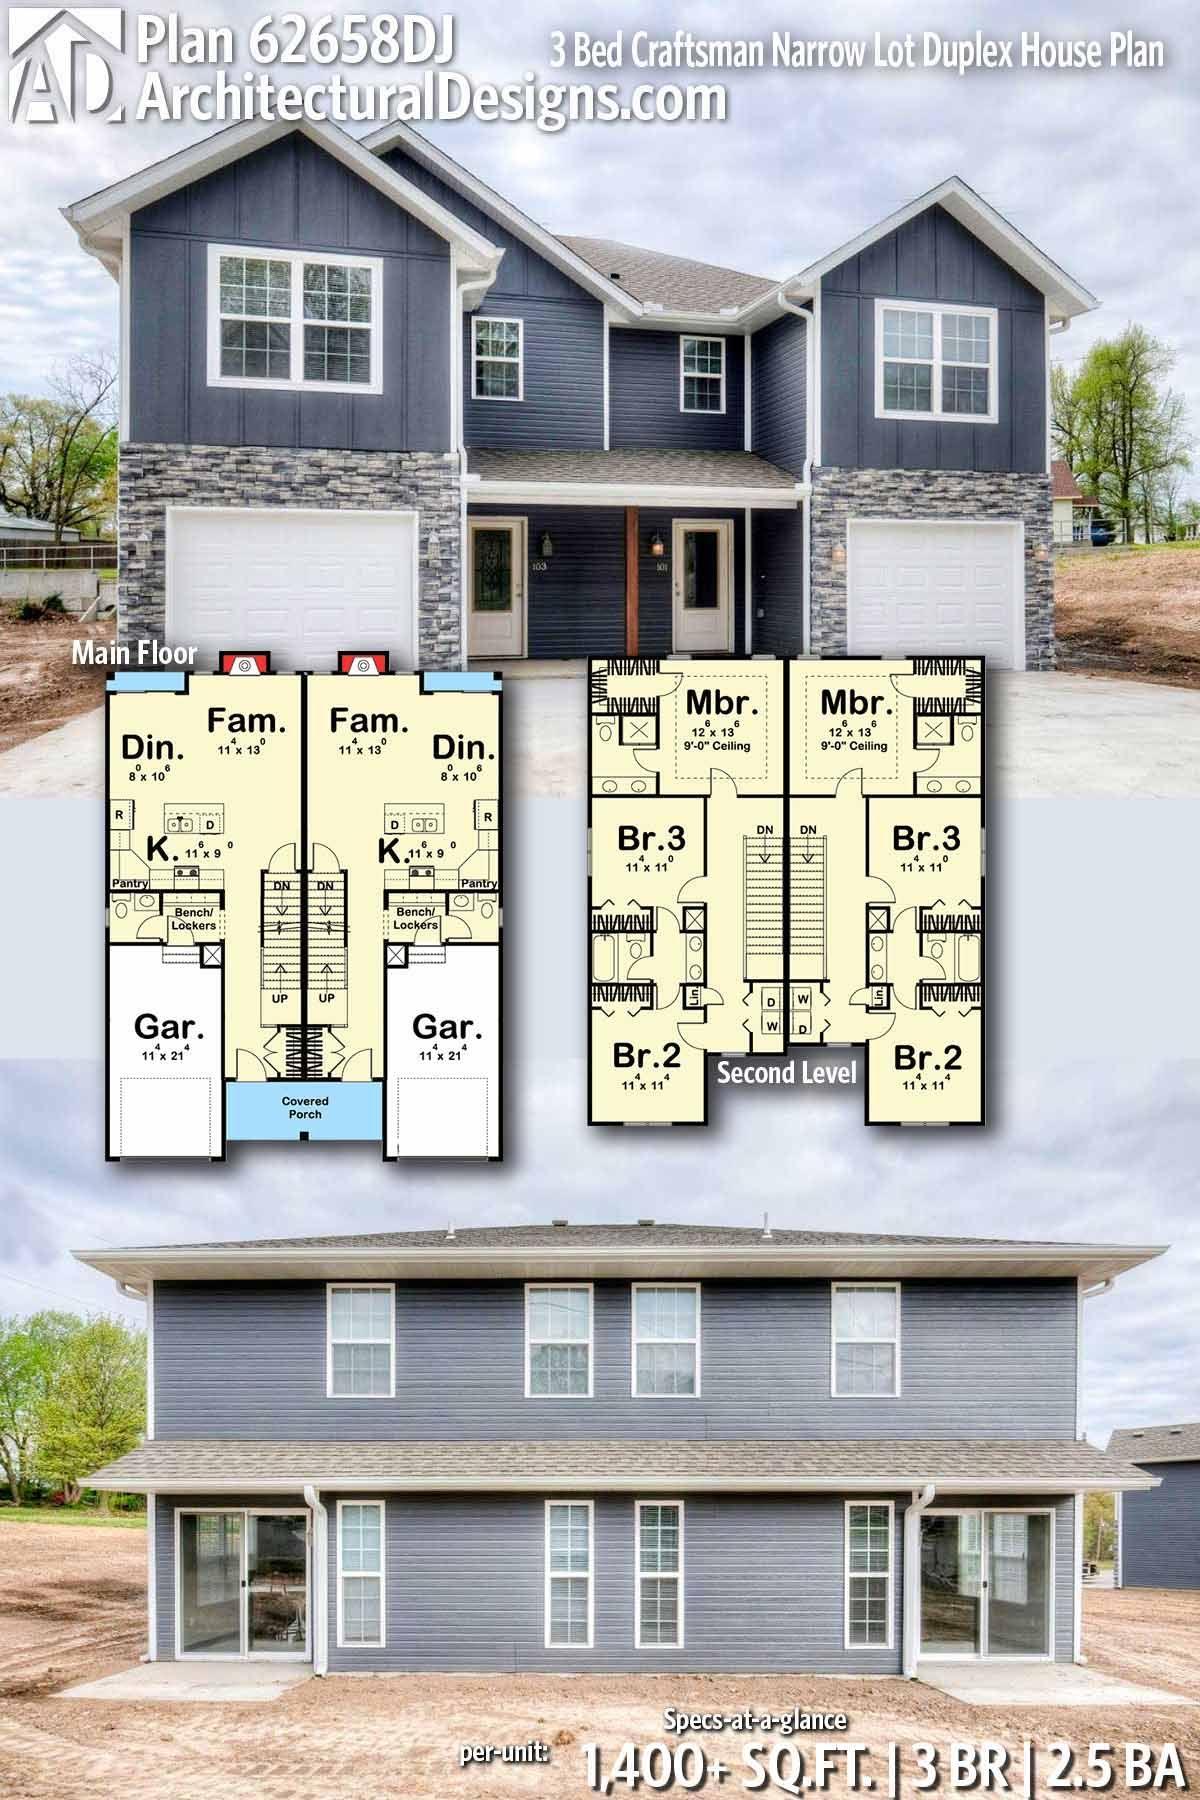 Plan 62658dj 3 Bed Craftsman Narrow Lot Duplex House Plan Family House Plans Duplex House Plans Duplex House